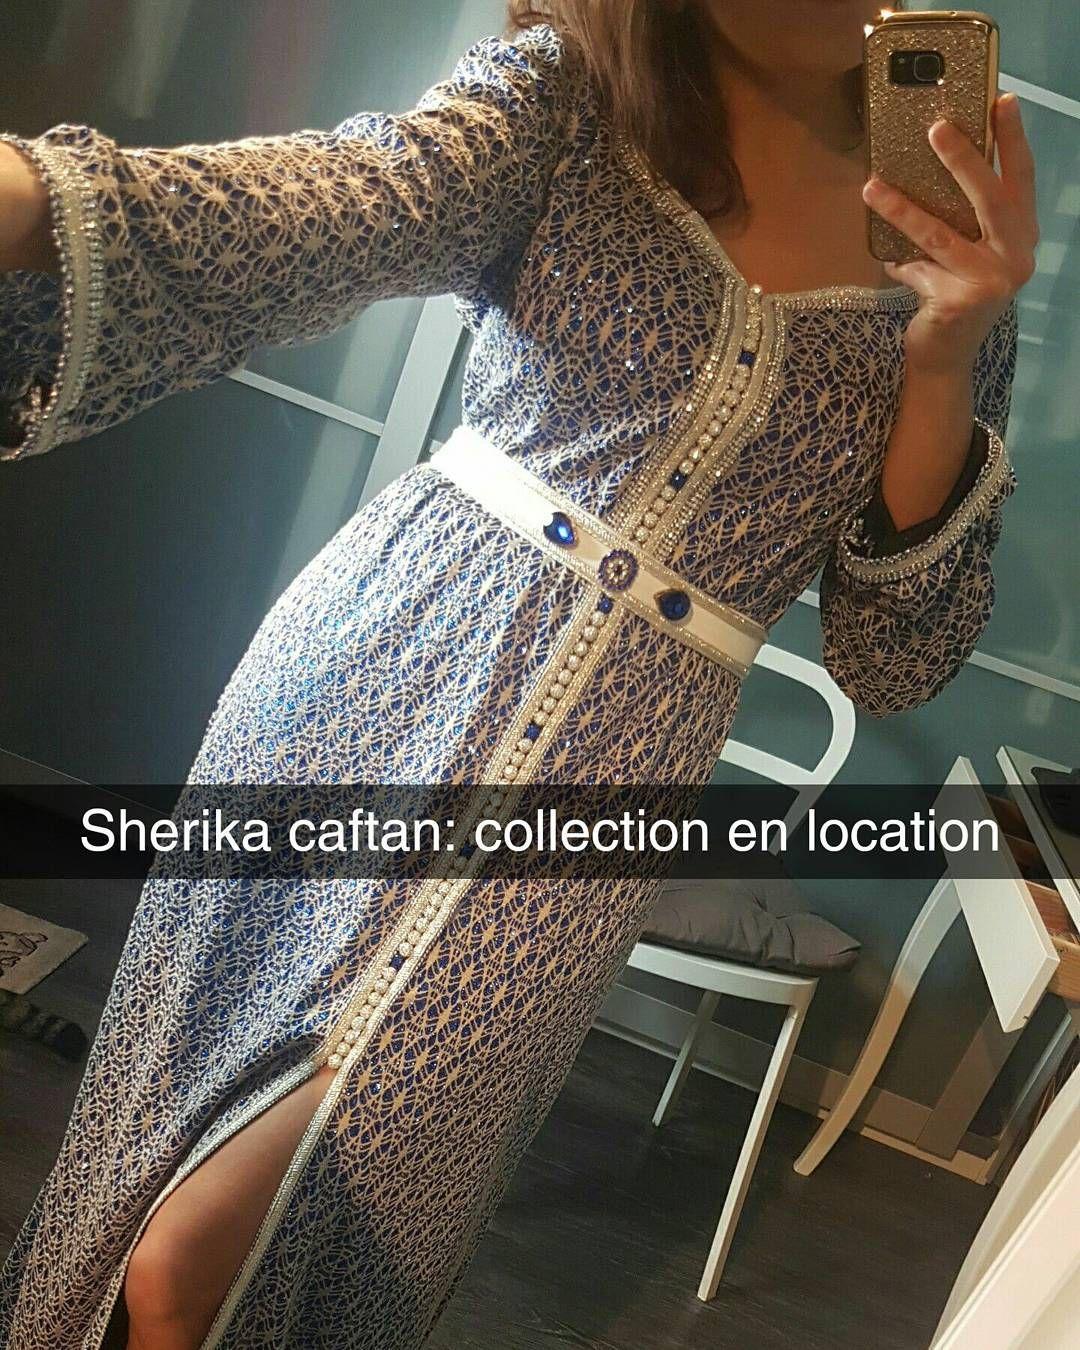 149 Mentions Jaime 2 Commentaires Sherika Caftan Sherikacaftan Jolie Clothing Aftan Dress Sur